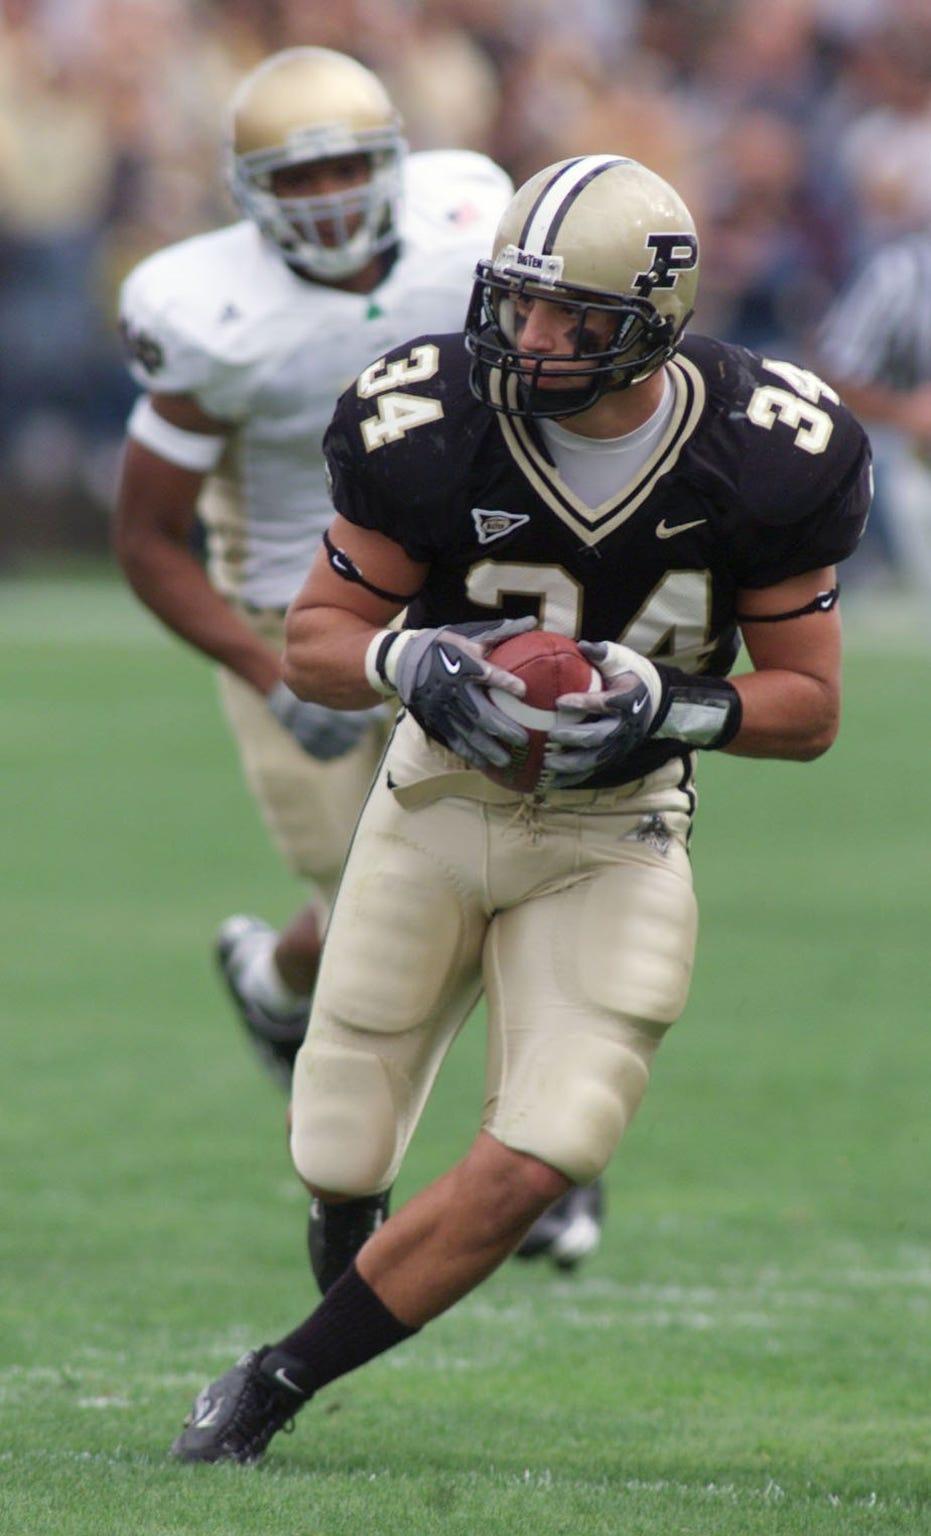 Purdue linebacker Niko Koutouvides returns an interception against Notre Dame during a 23-10 vjctory in 2003.